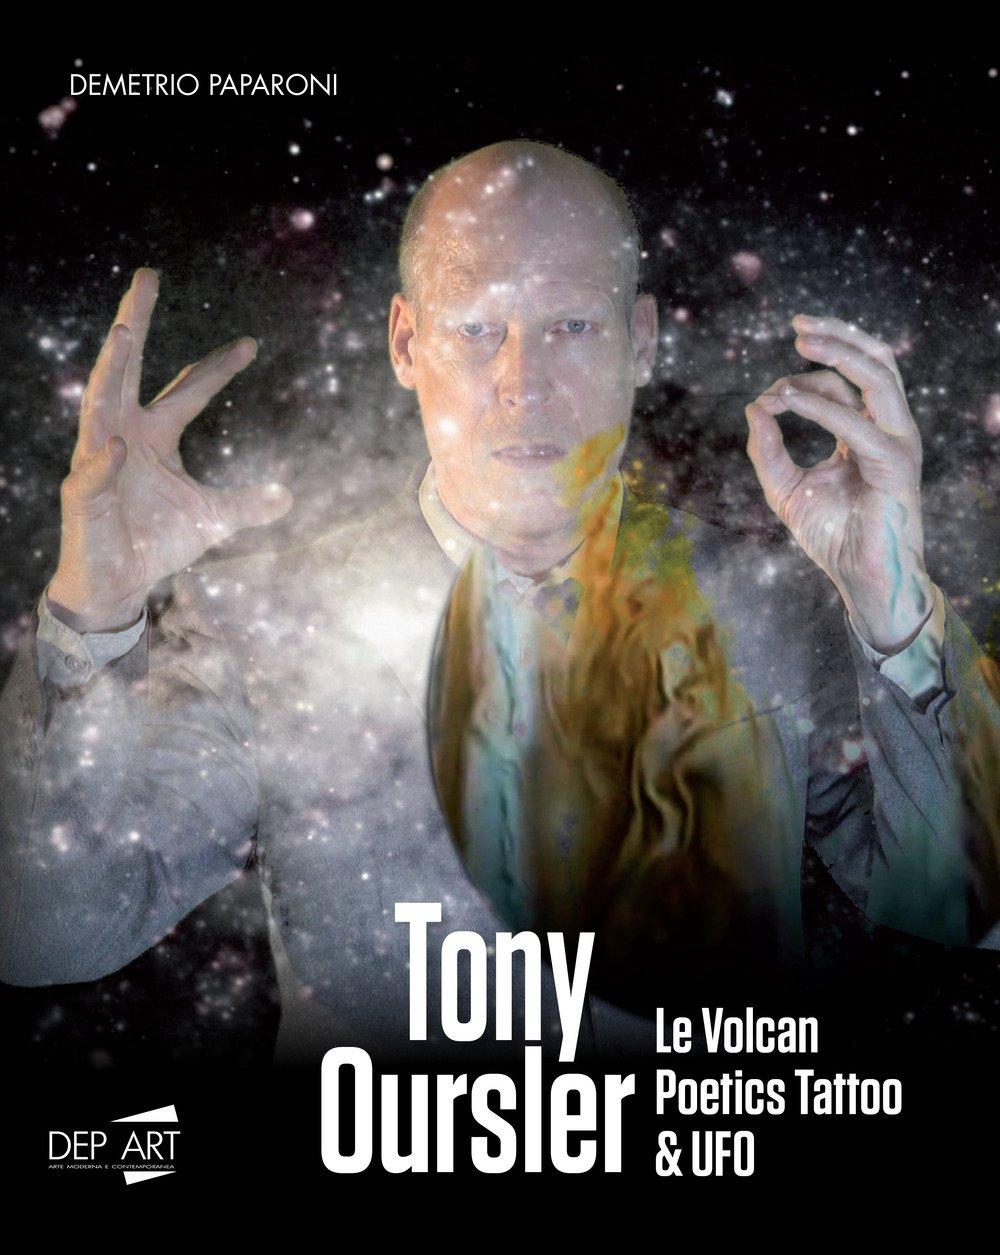 Tony Oursler. Le volcan, poetics tattoo & UFO.